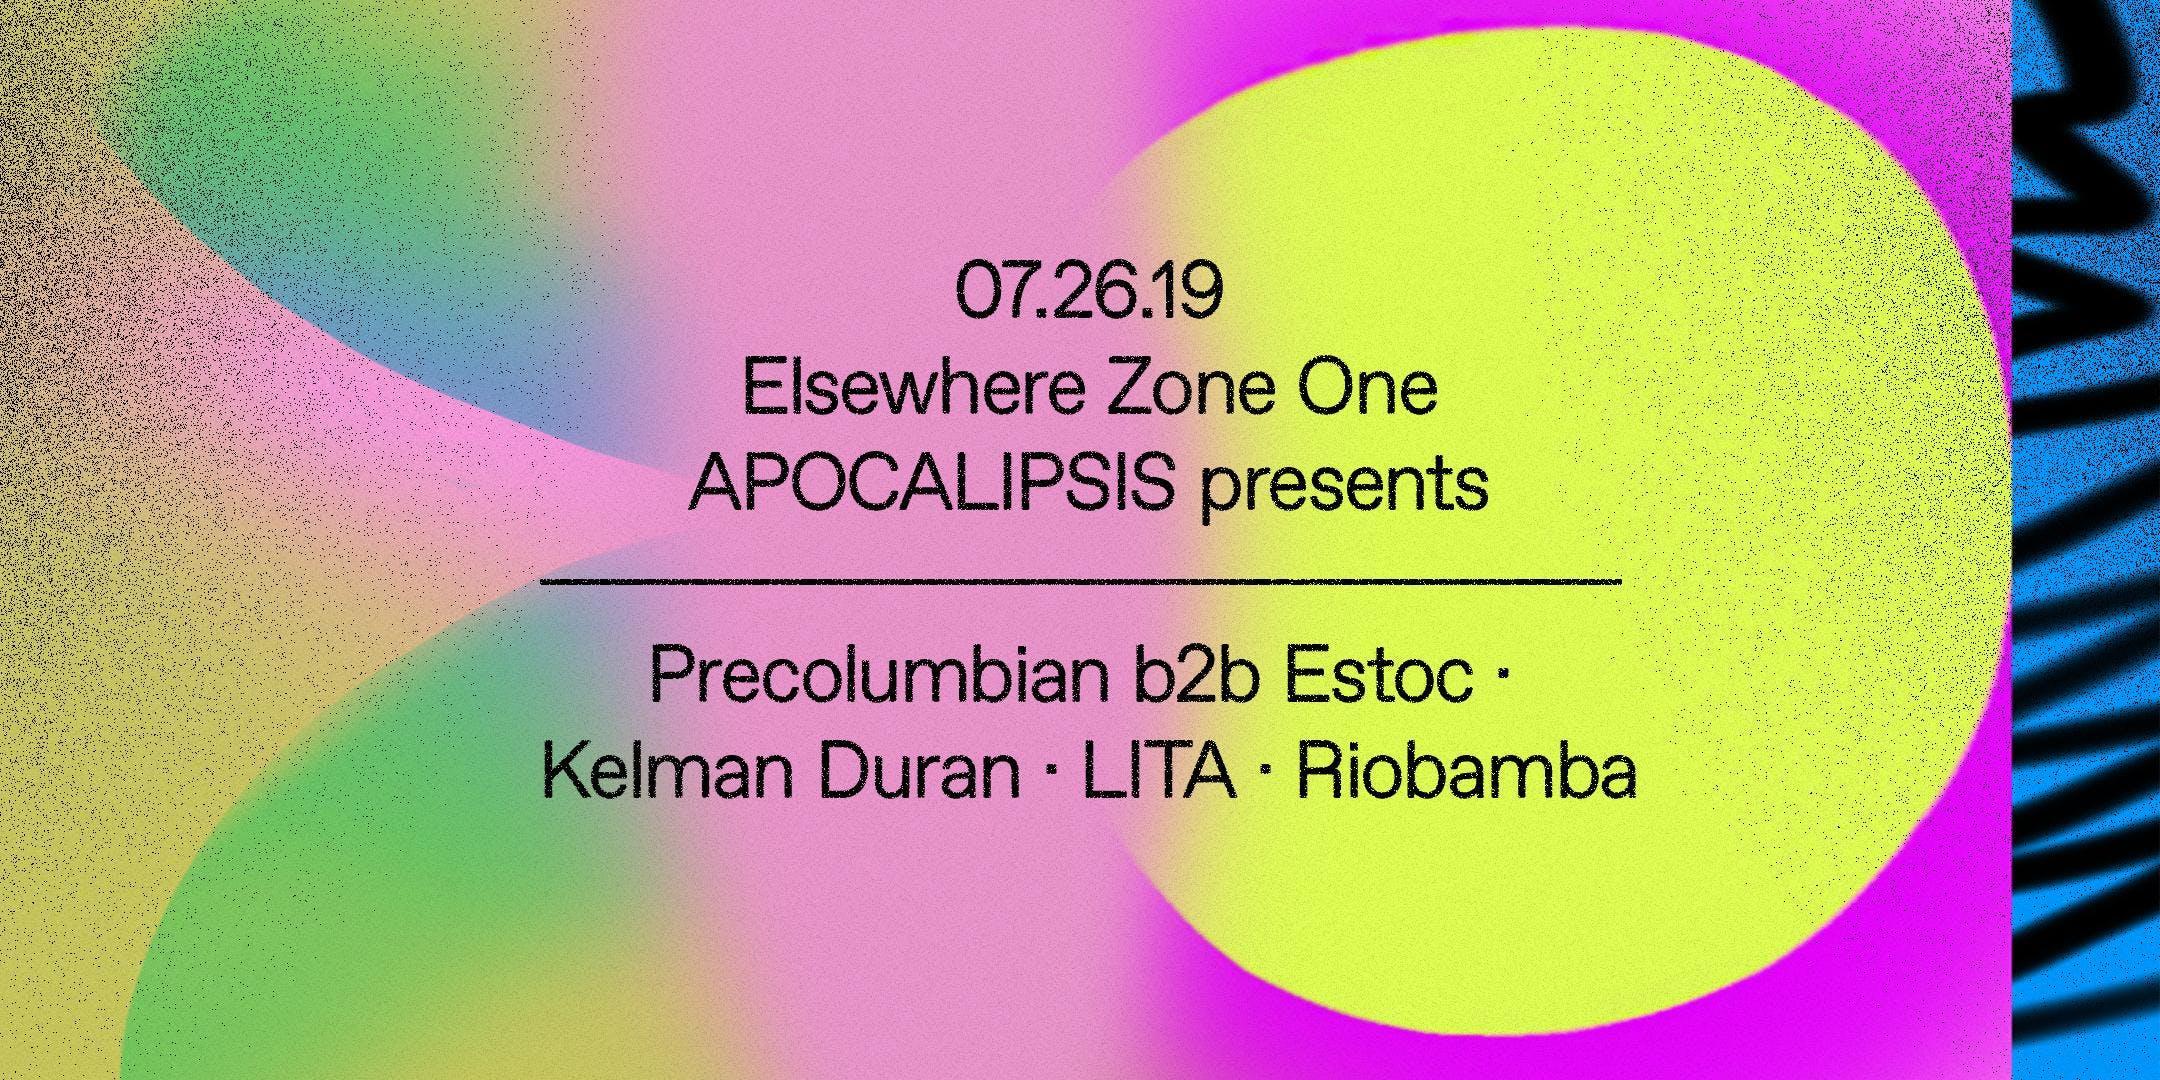 APOCALIPSIS Presents: Precolumbian B2B Estoc, Kelman Duran, LITA & Riobamba